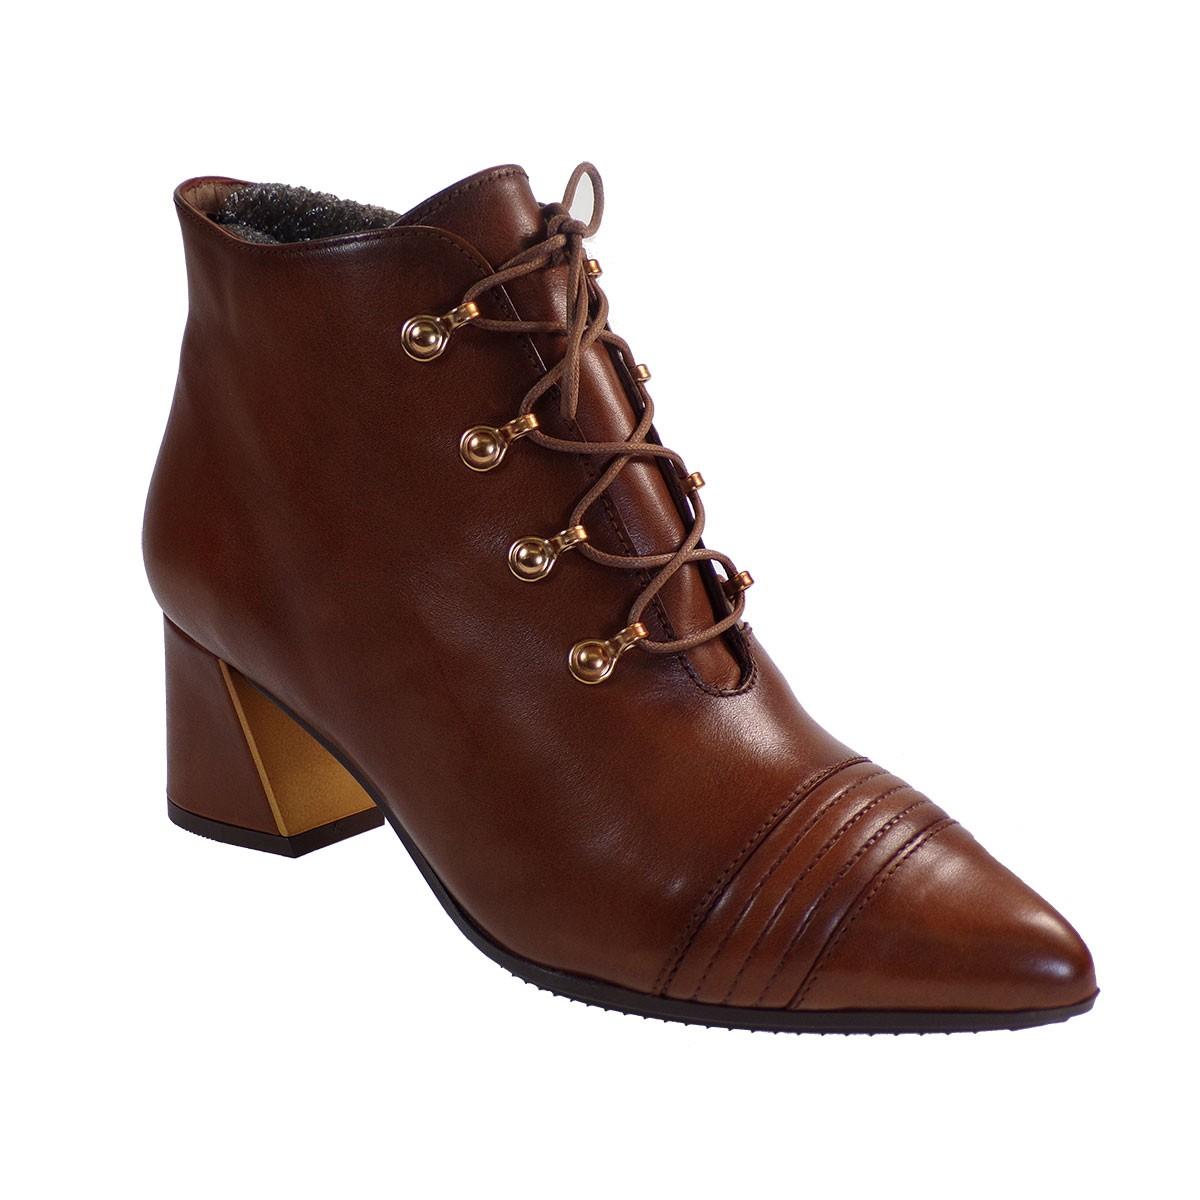 Hispanitas Γυναικεία Παπούτσια Mποτάκια HI00757 Ταμπά Δέρμα